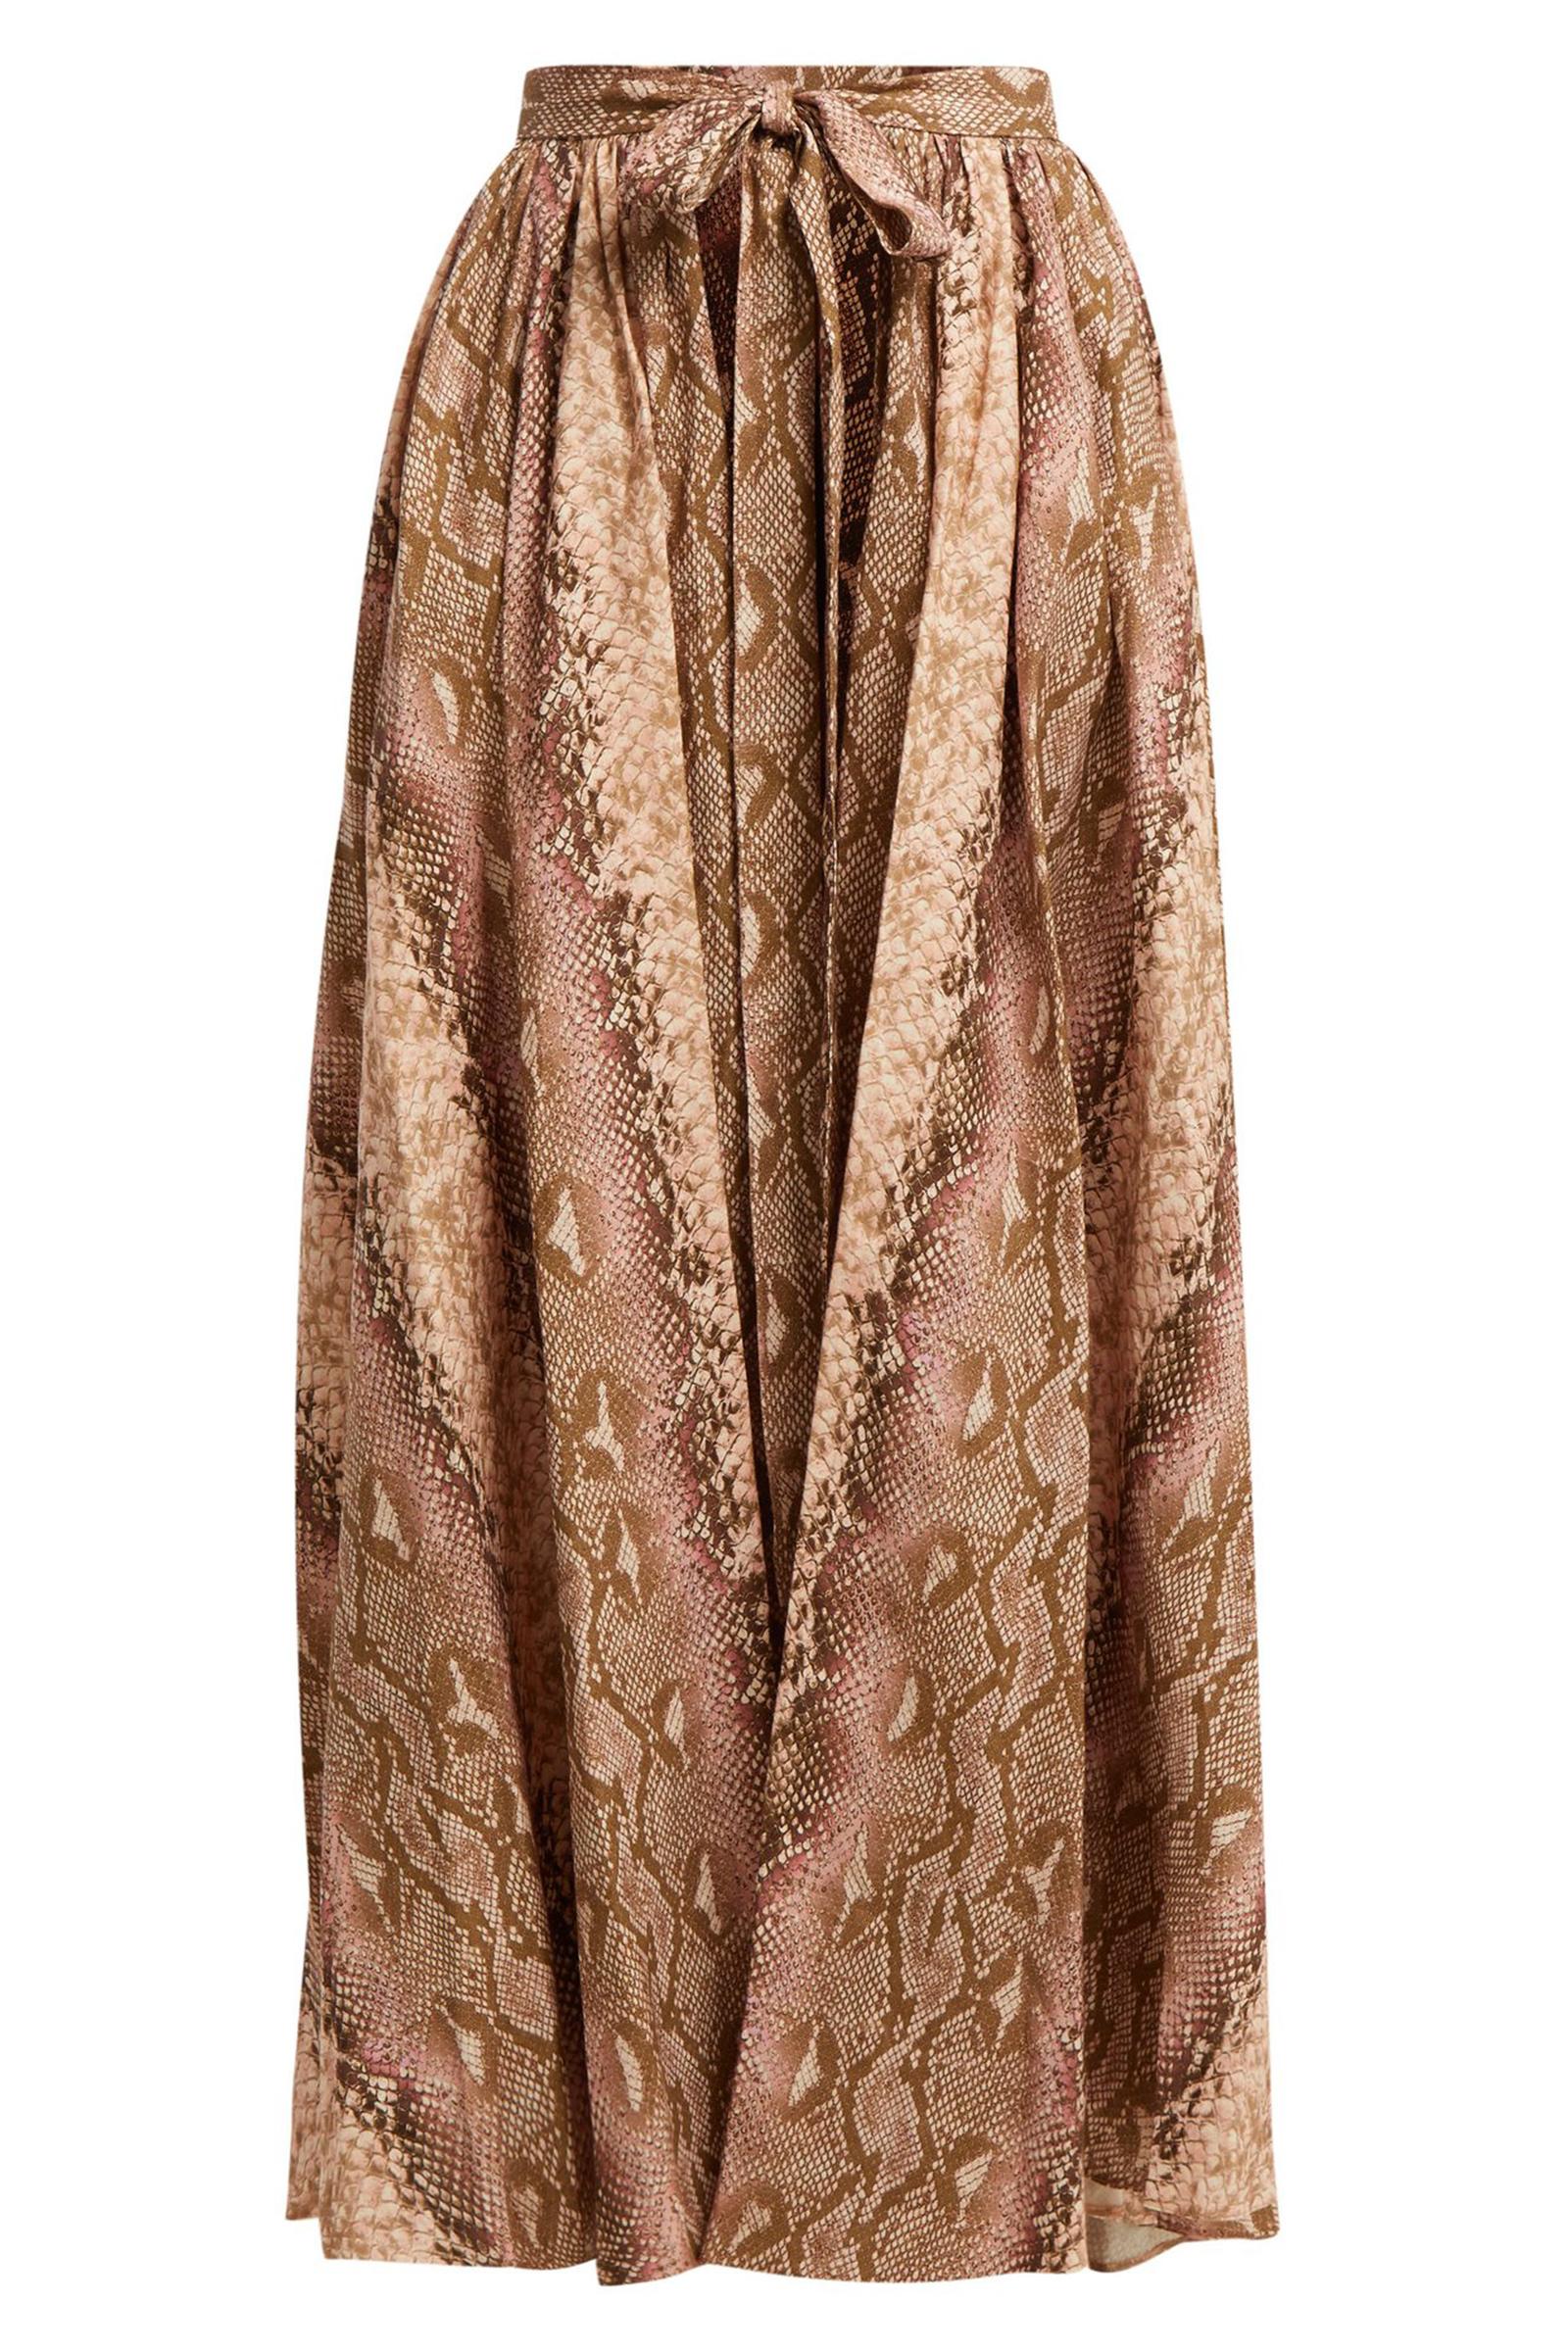 Emilia Wickstead Python Skirt